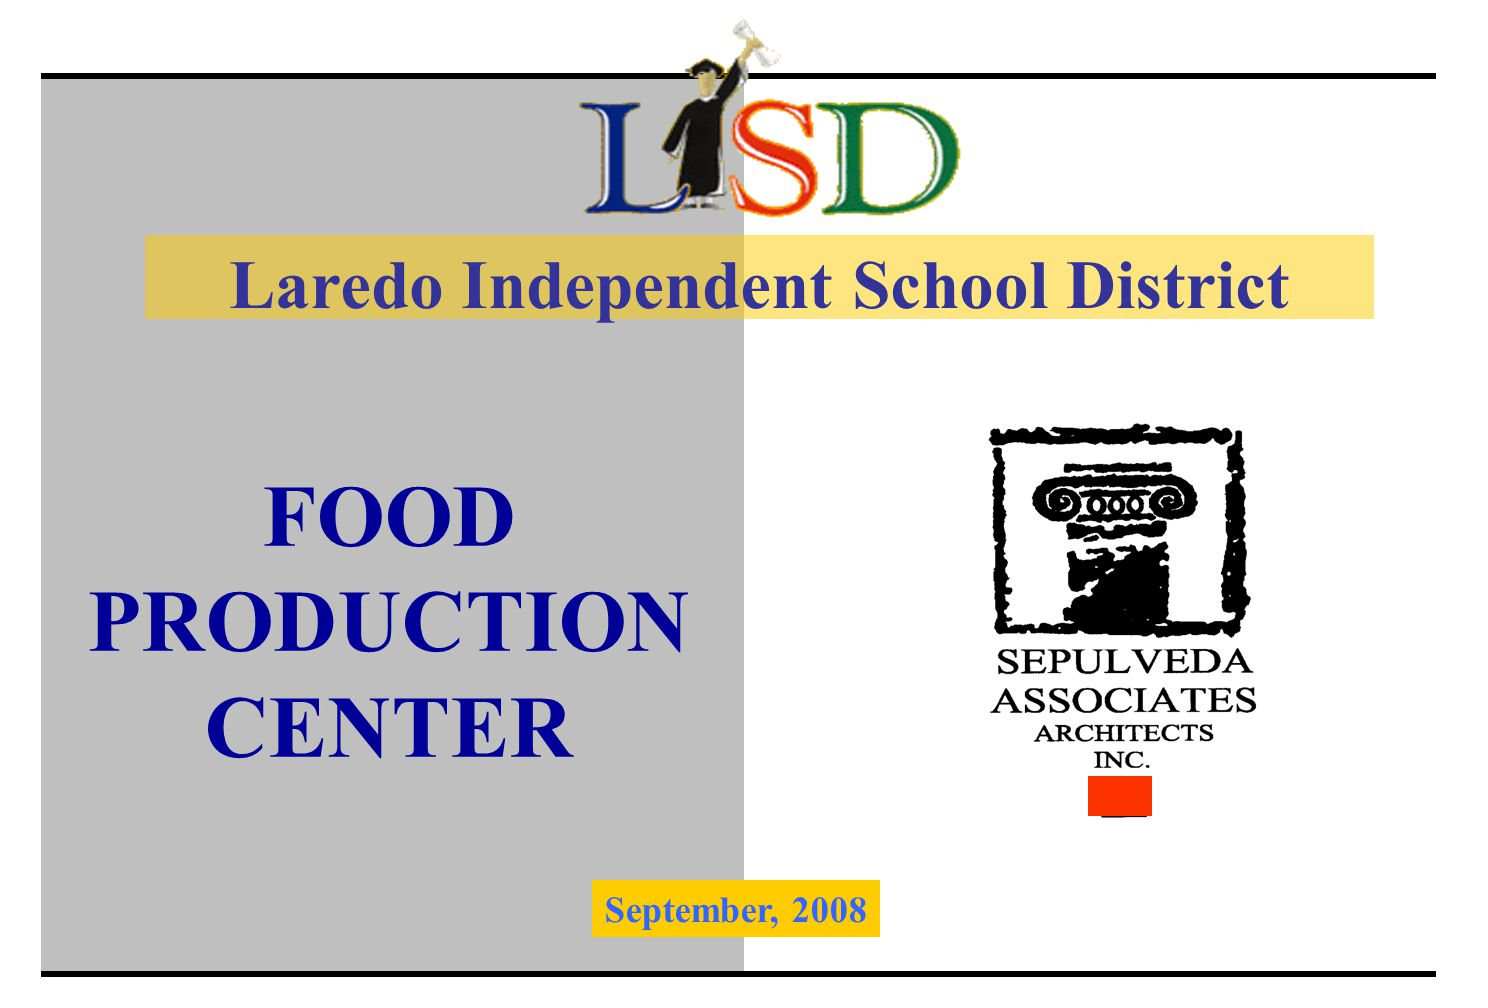 FOODPRODUCTIONCENTER Laredo Independent School District September, 2008